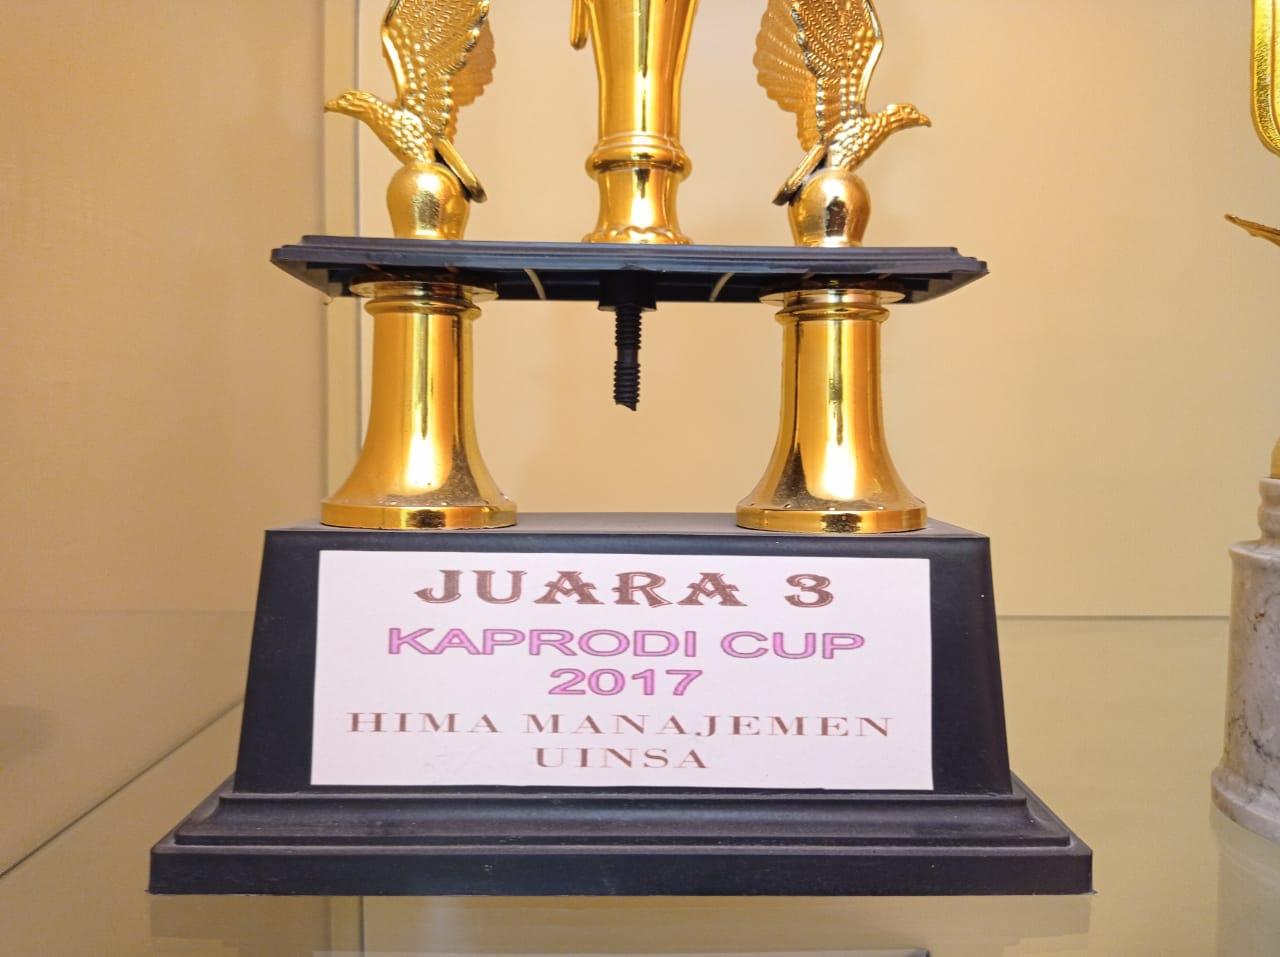 JUARA III KAPRODI CUP 2017